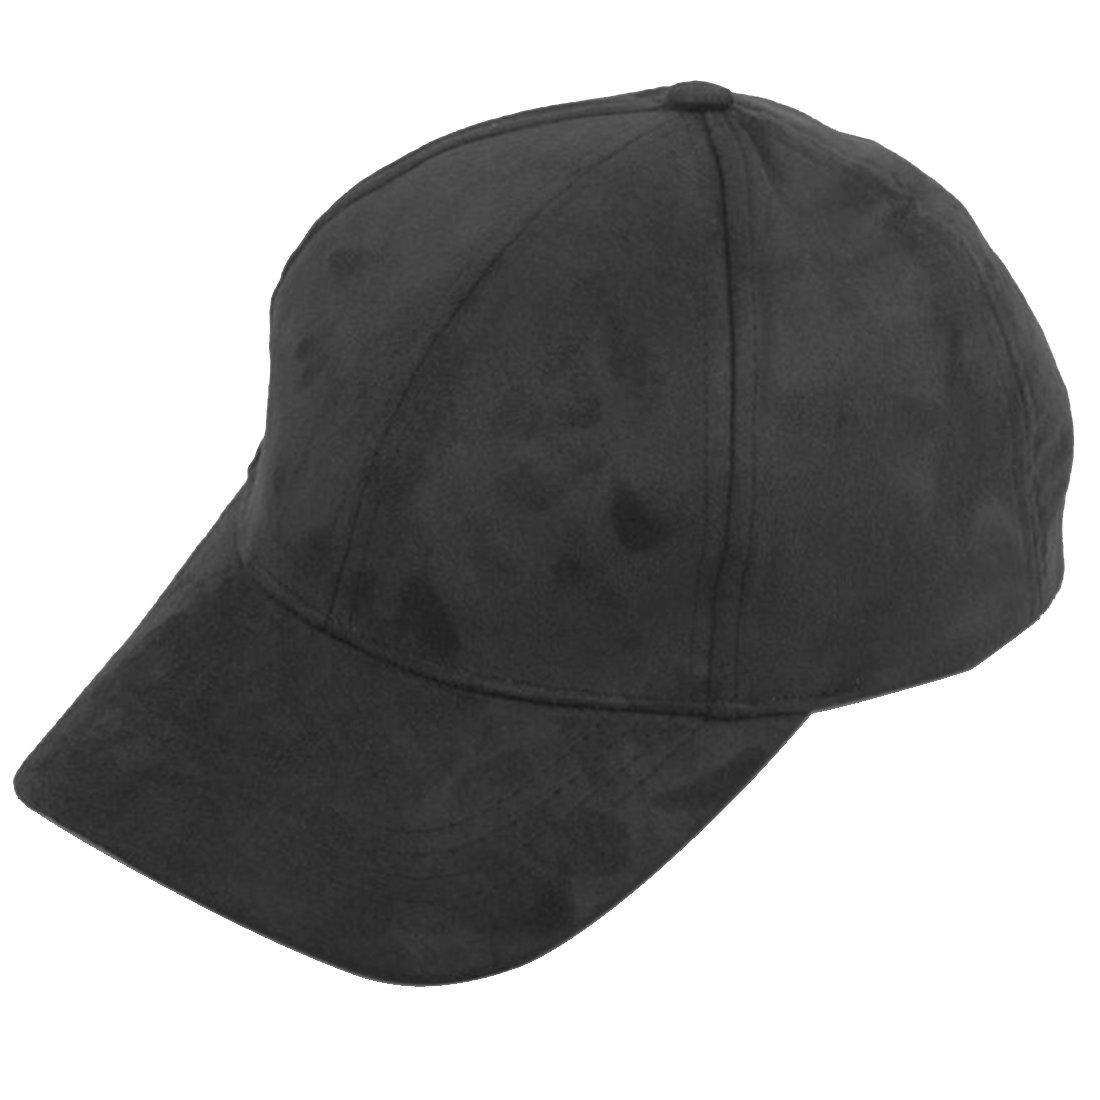 db71ec40474ceb Amazon.com: Faux Suede Solid Baseball Cap Adjustable Black: Clothing